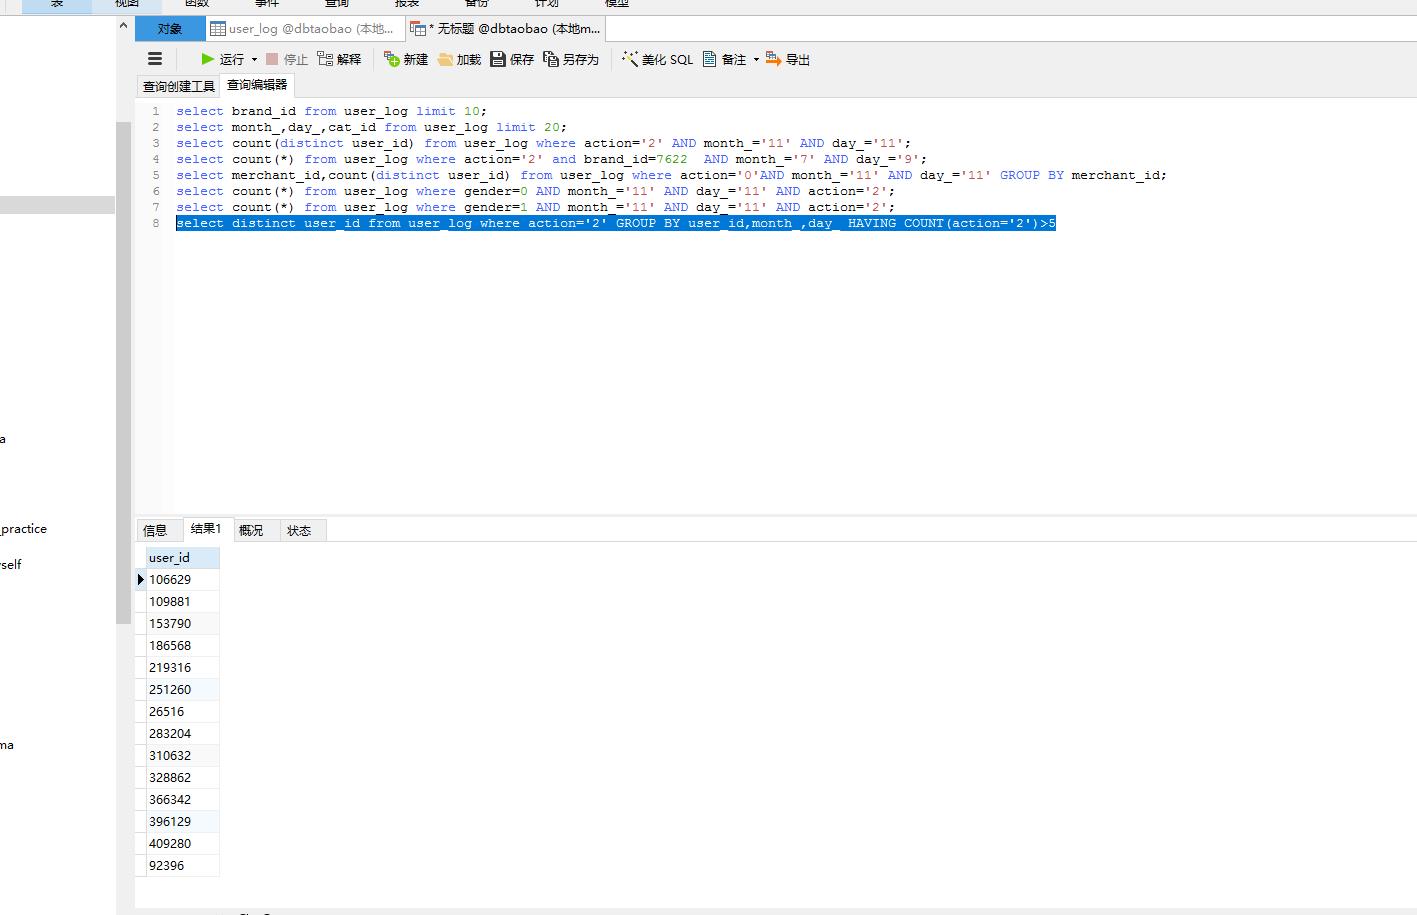 java spark淘宝大数据分析可视化系统(源码+数据+报告)